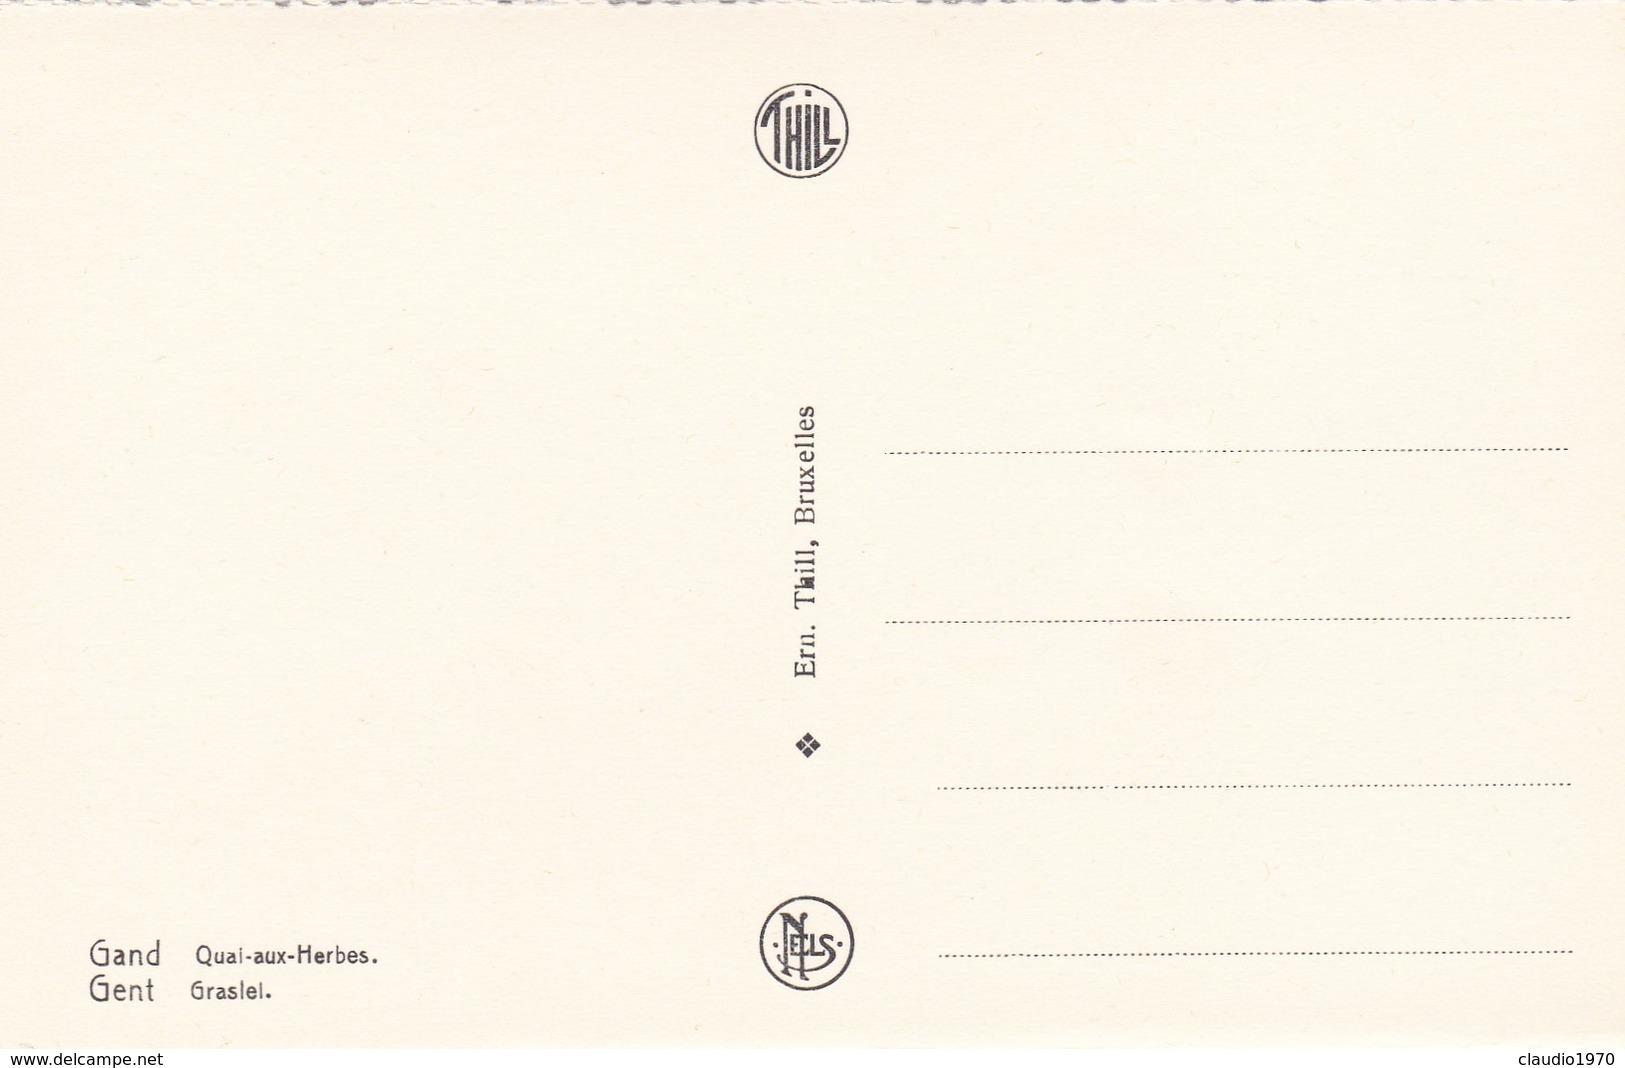 CARTOLINA - POSTCARD - BELGIO - GENT - GRASLEL - Gent